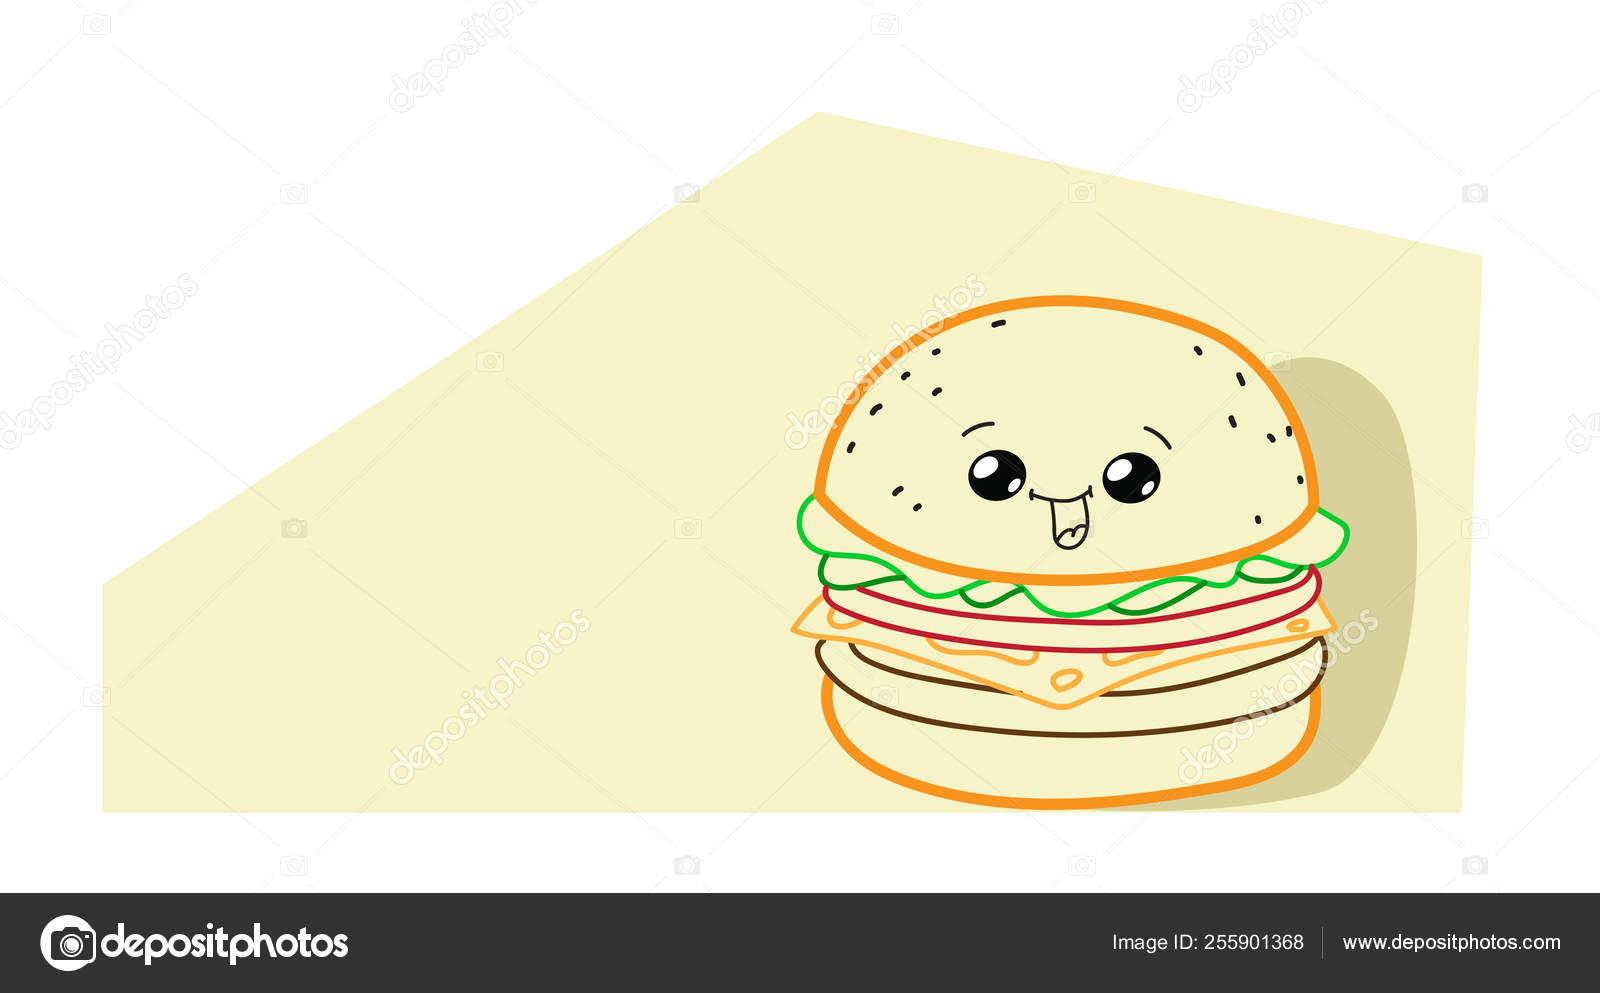 Cute Hamburger Cartoon Comic Character With Smiling Face Tasty